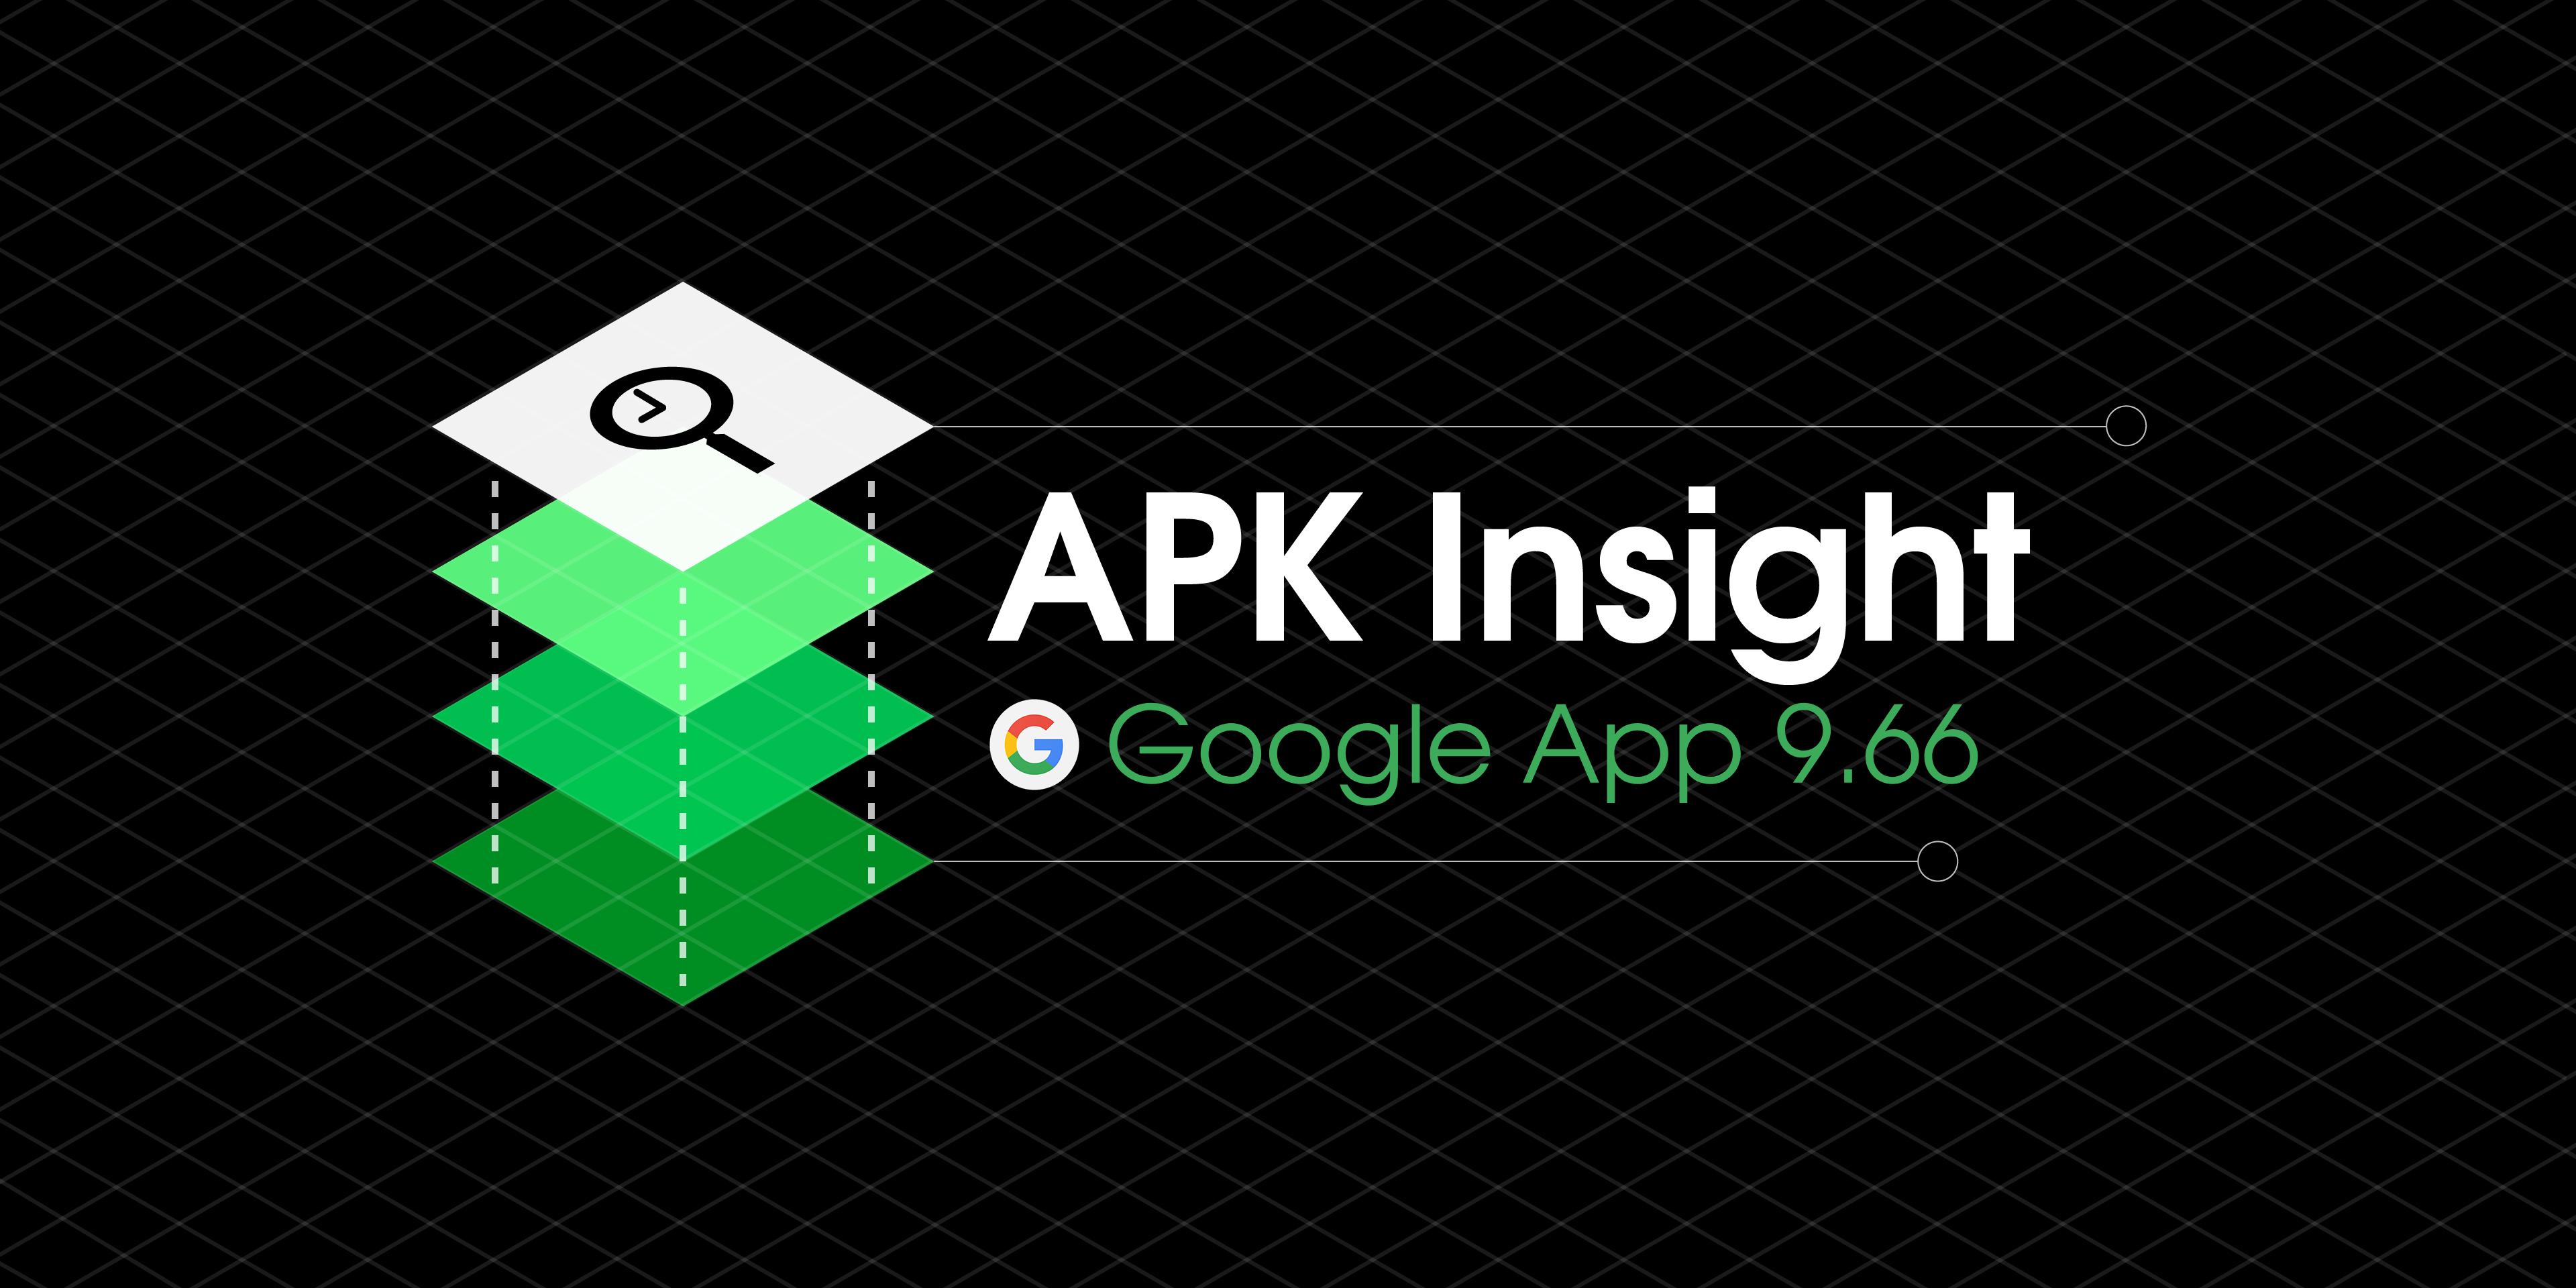 Google app 9.66 preps dark theme, 'Assistant powered intelligent tips,' Face Match training [APK Insight]